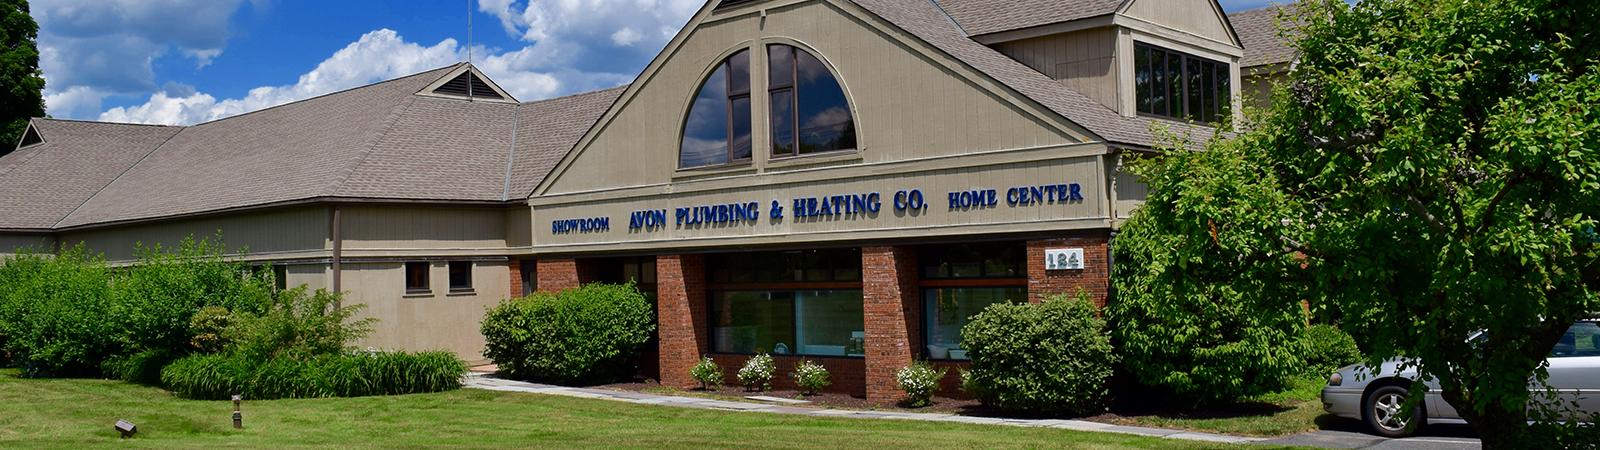 Our Team - Avon Plumbing & Heating